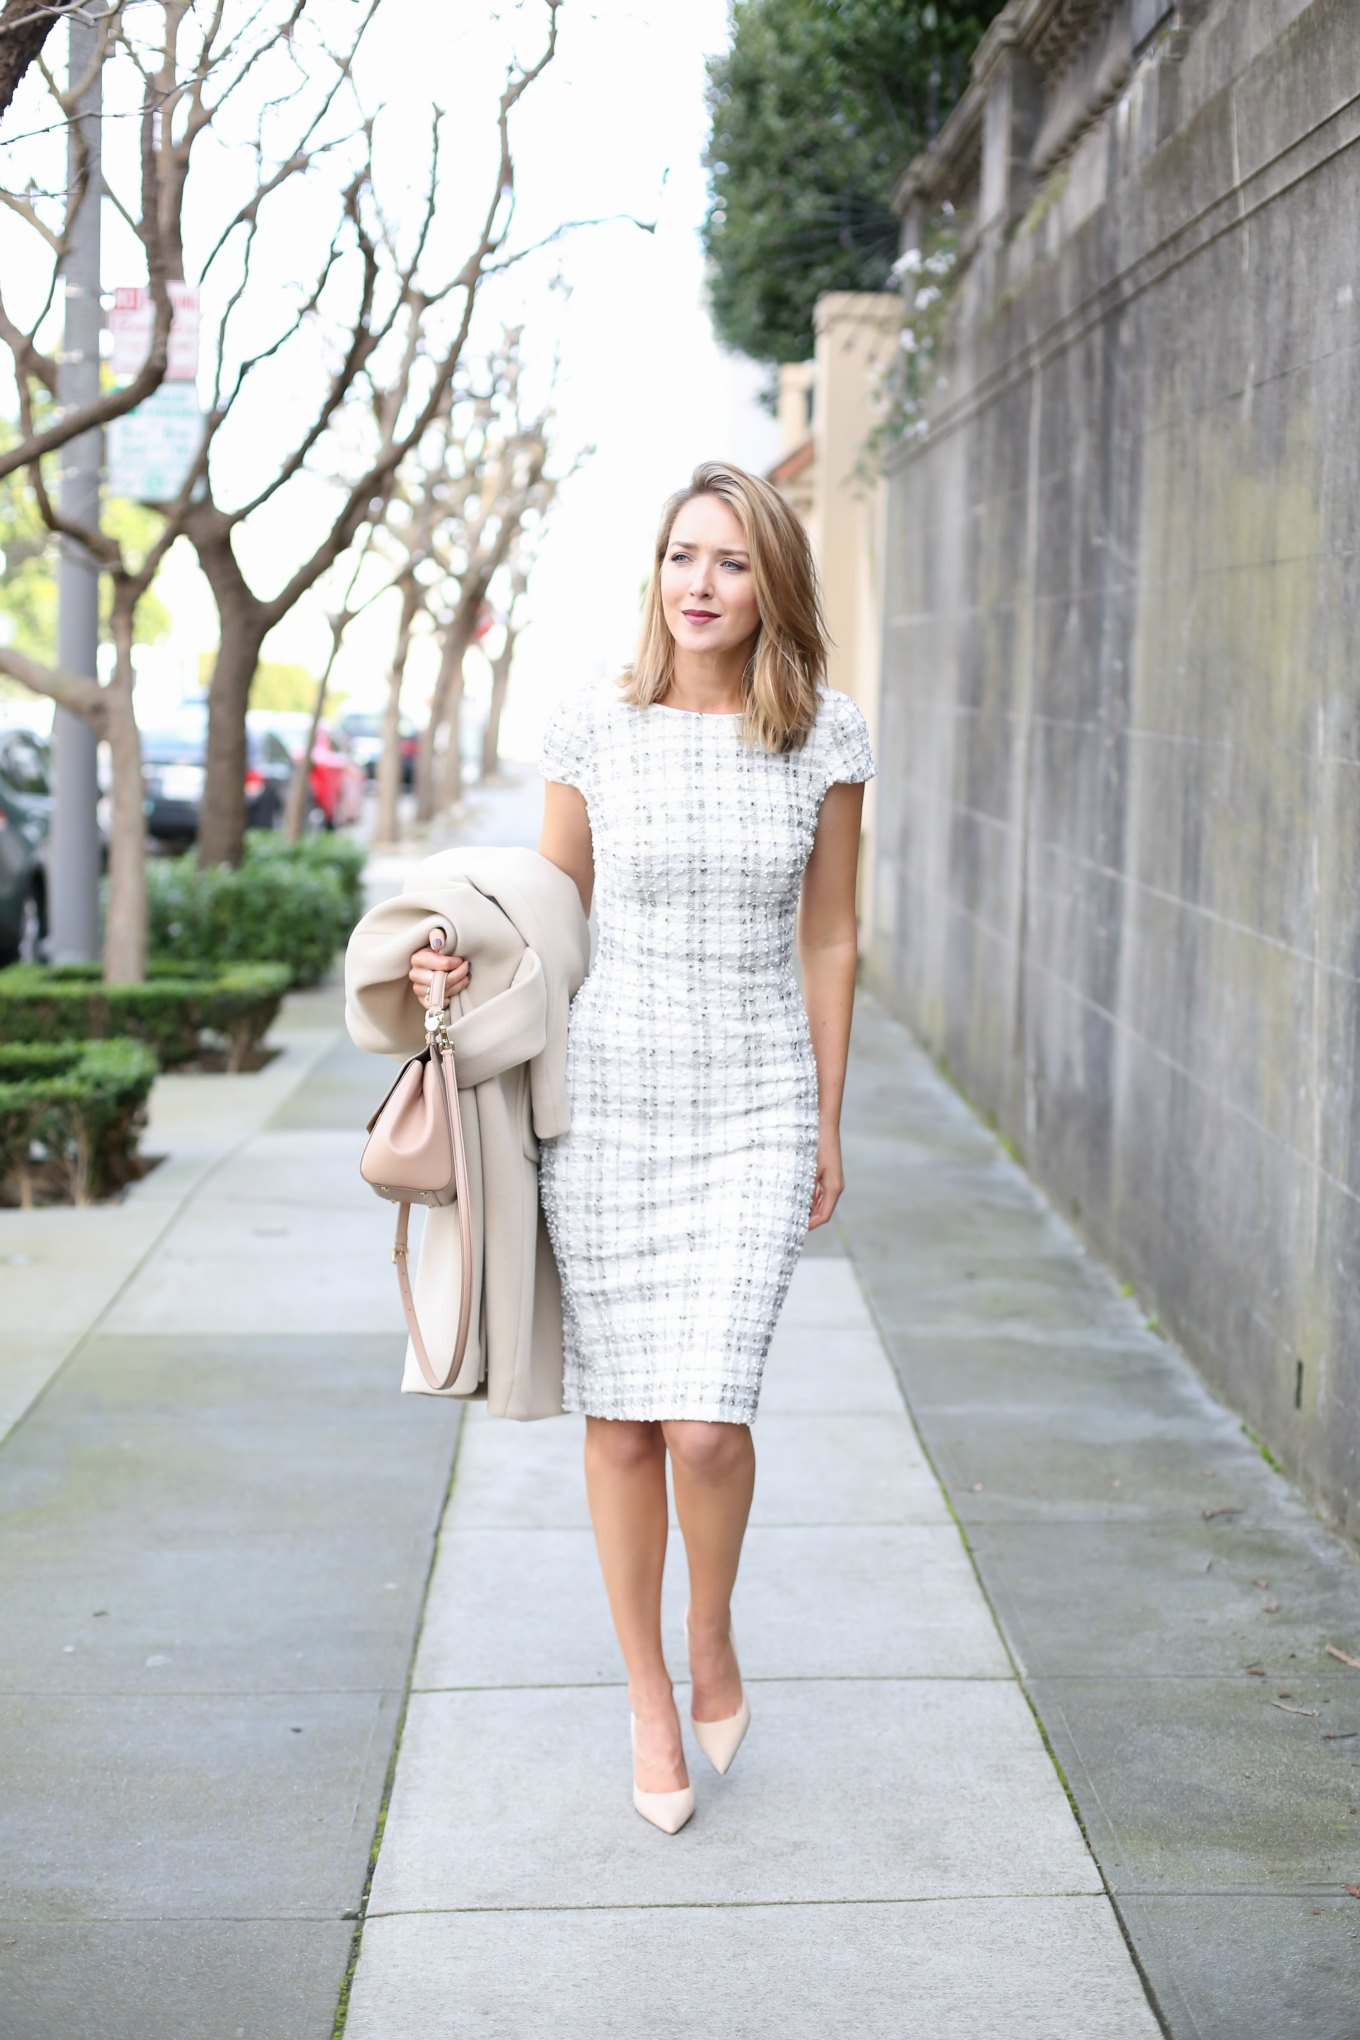 ideas para lucir vestidos de oficina elegantes con estampados